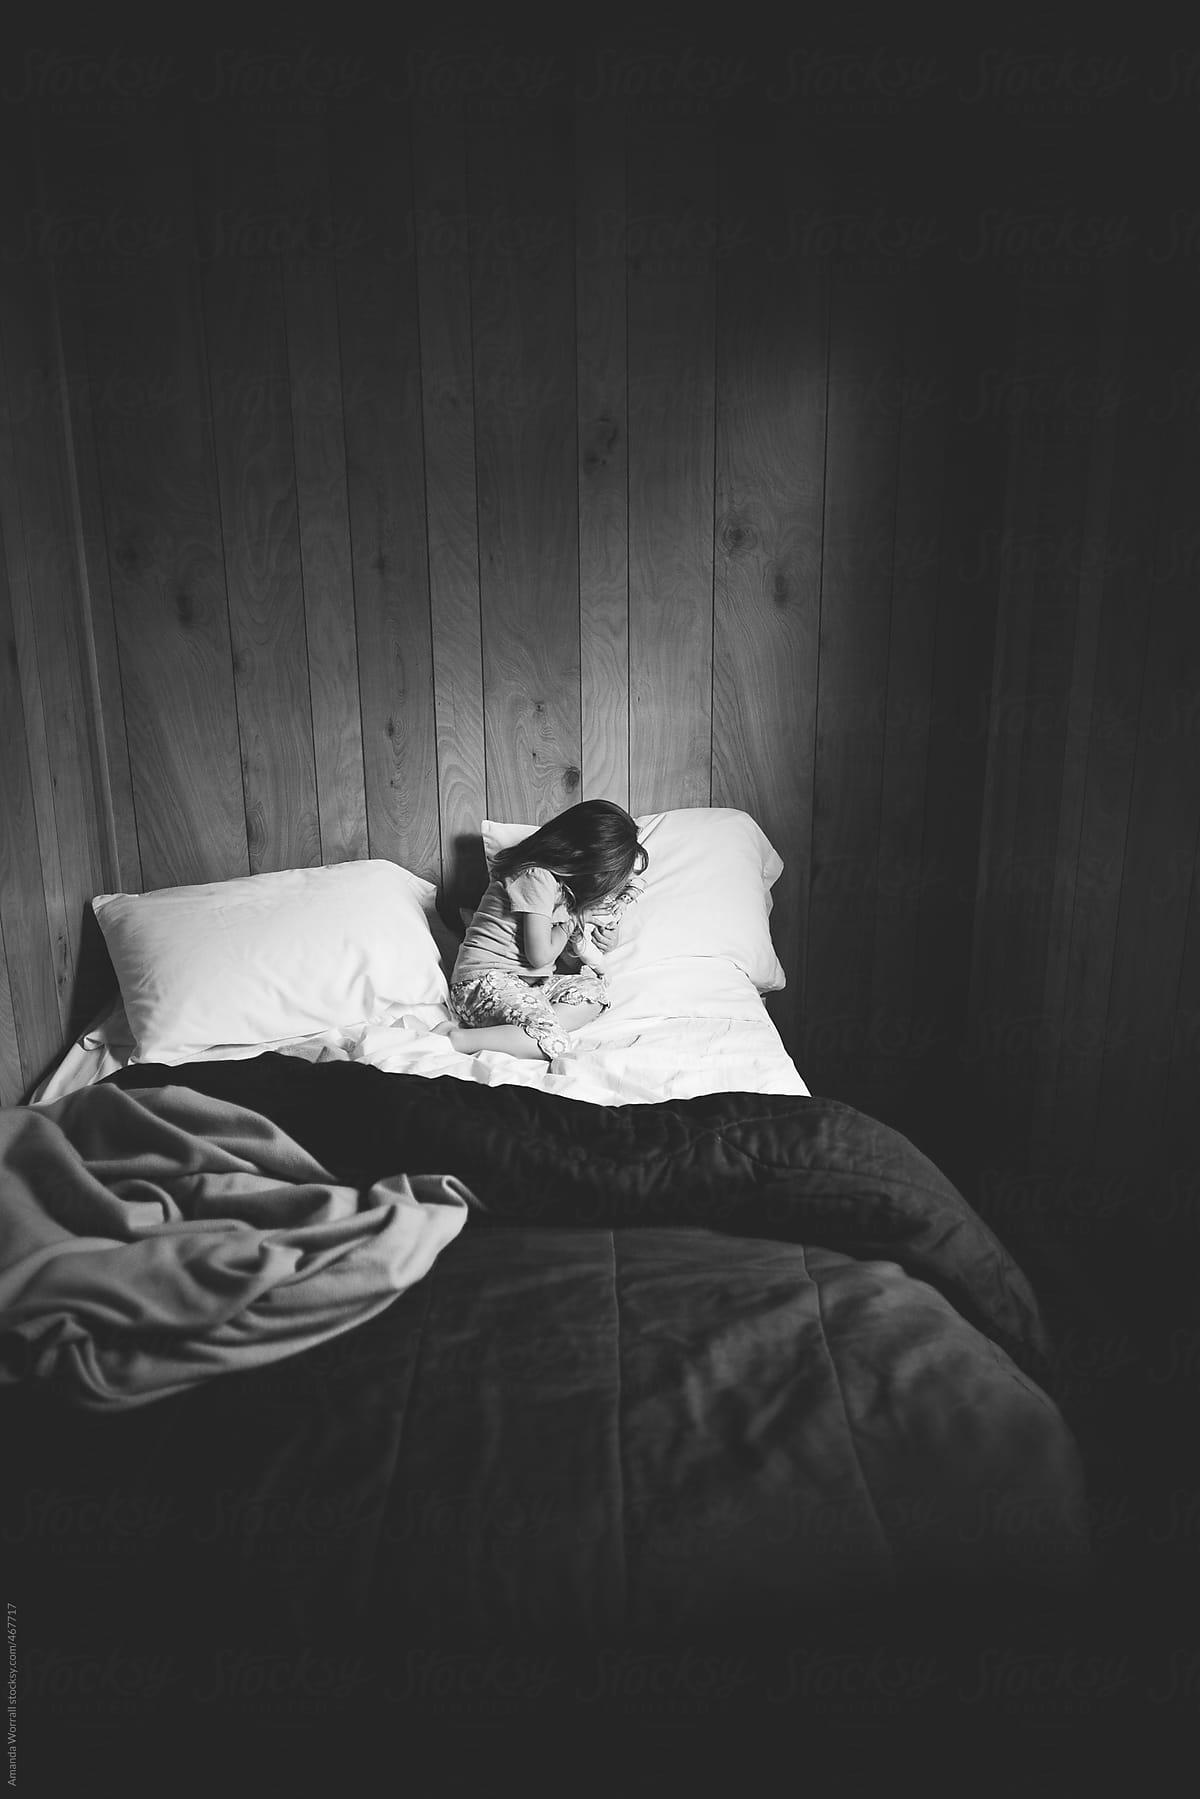 child hiding face on bed in dark room stocksy united rh stocksy com dark room medical dark room edinburgh festival